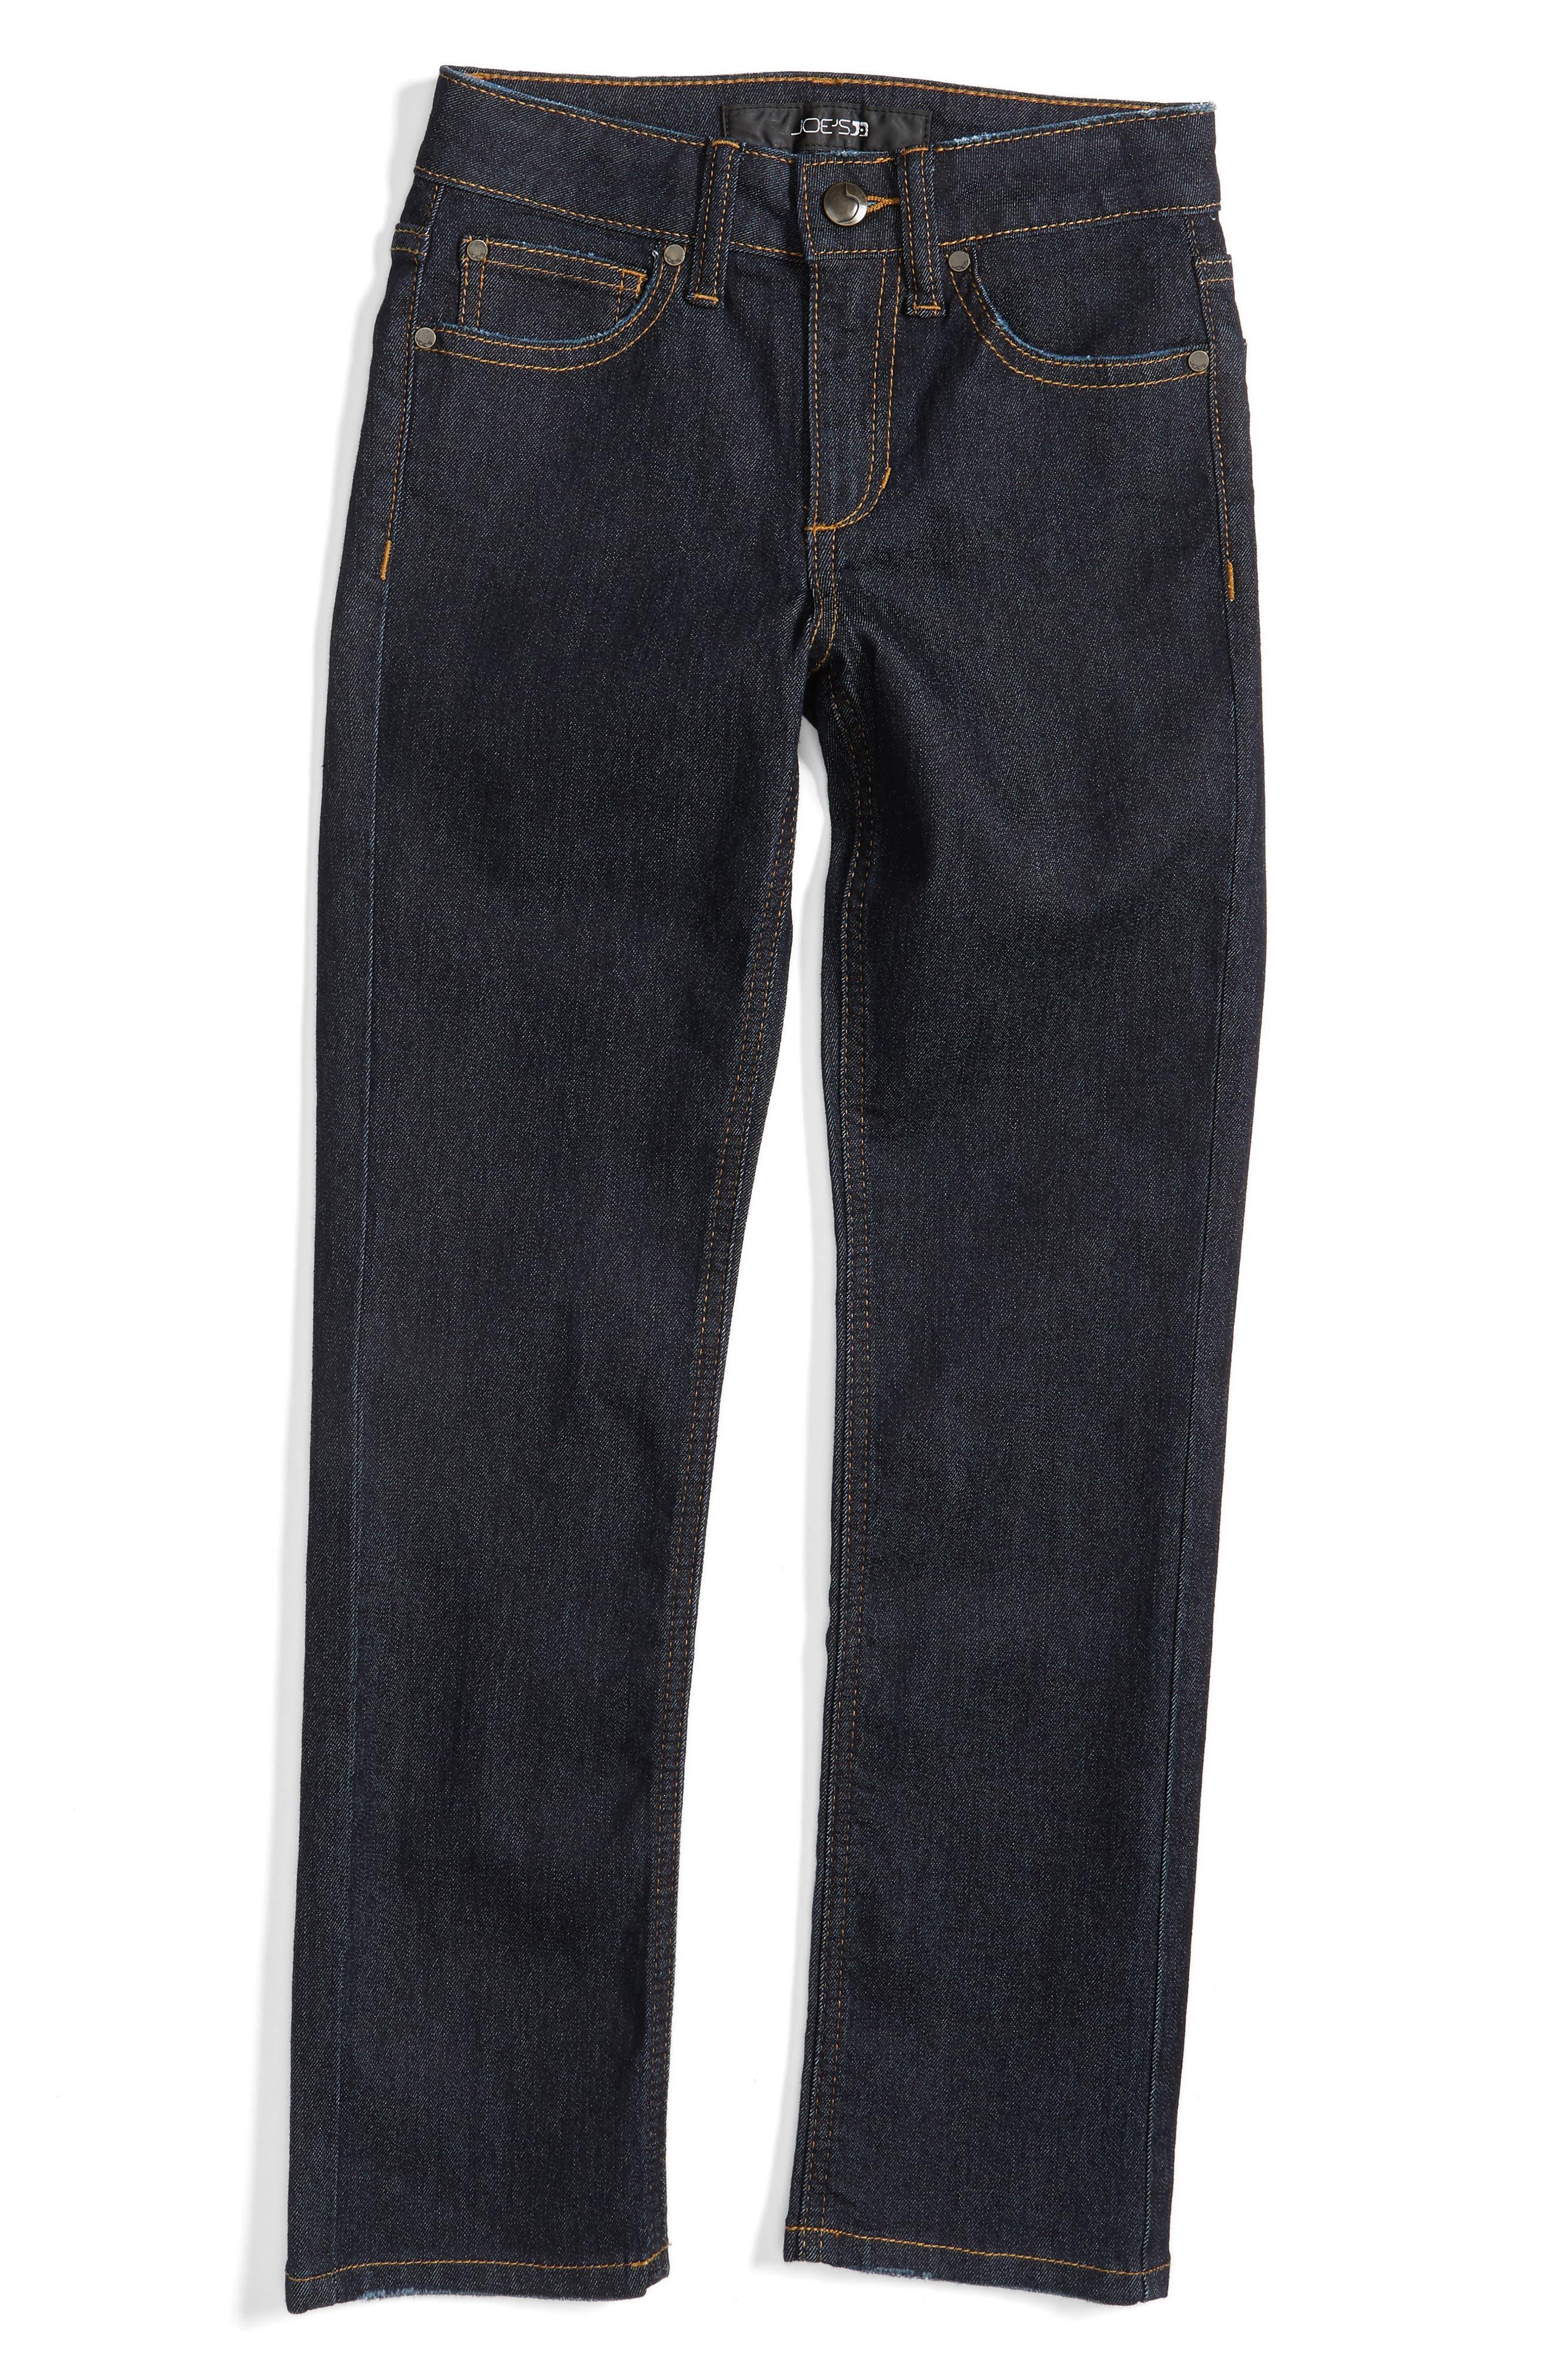 Brixton Straight Leg Jeans,                             Alternate thumbnail 2, color,                             400